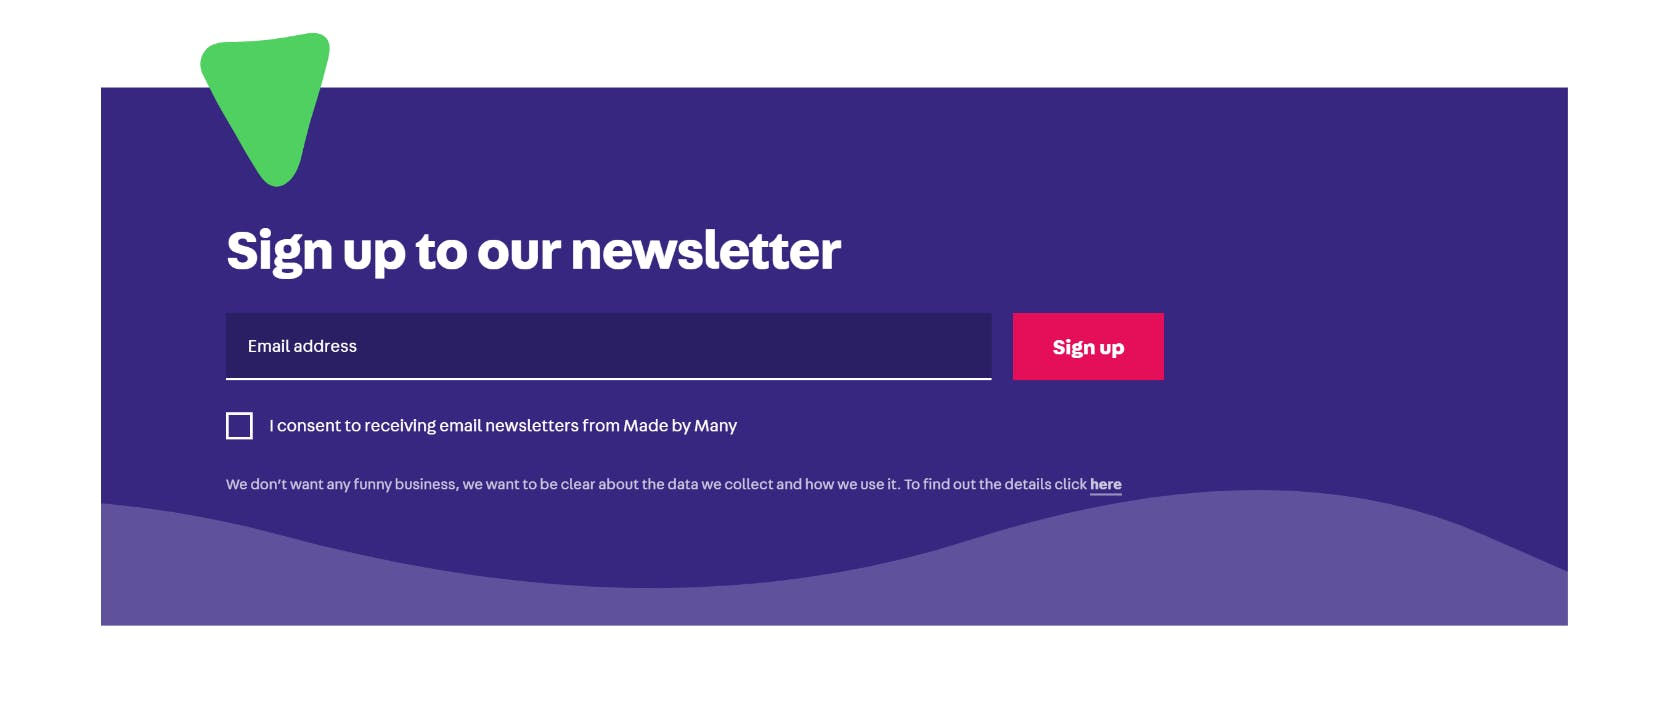 mbm-newsletter-signup